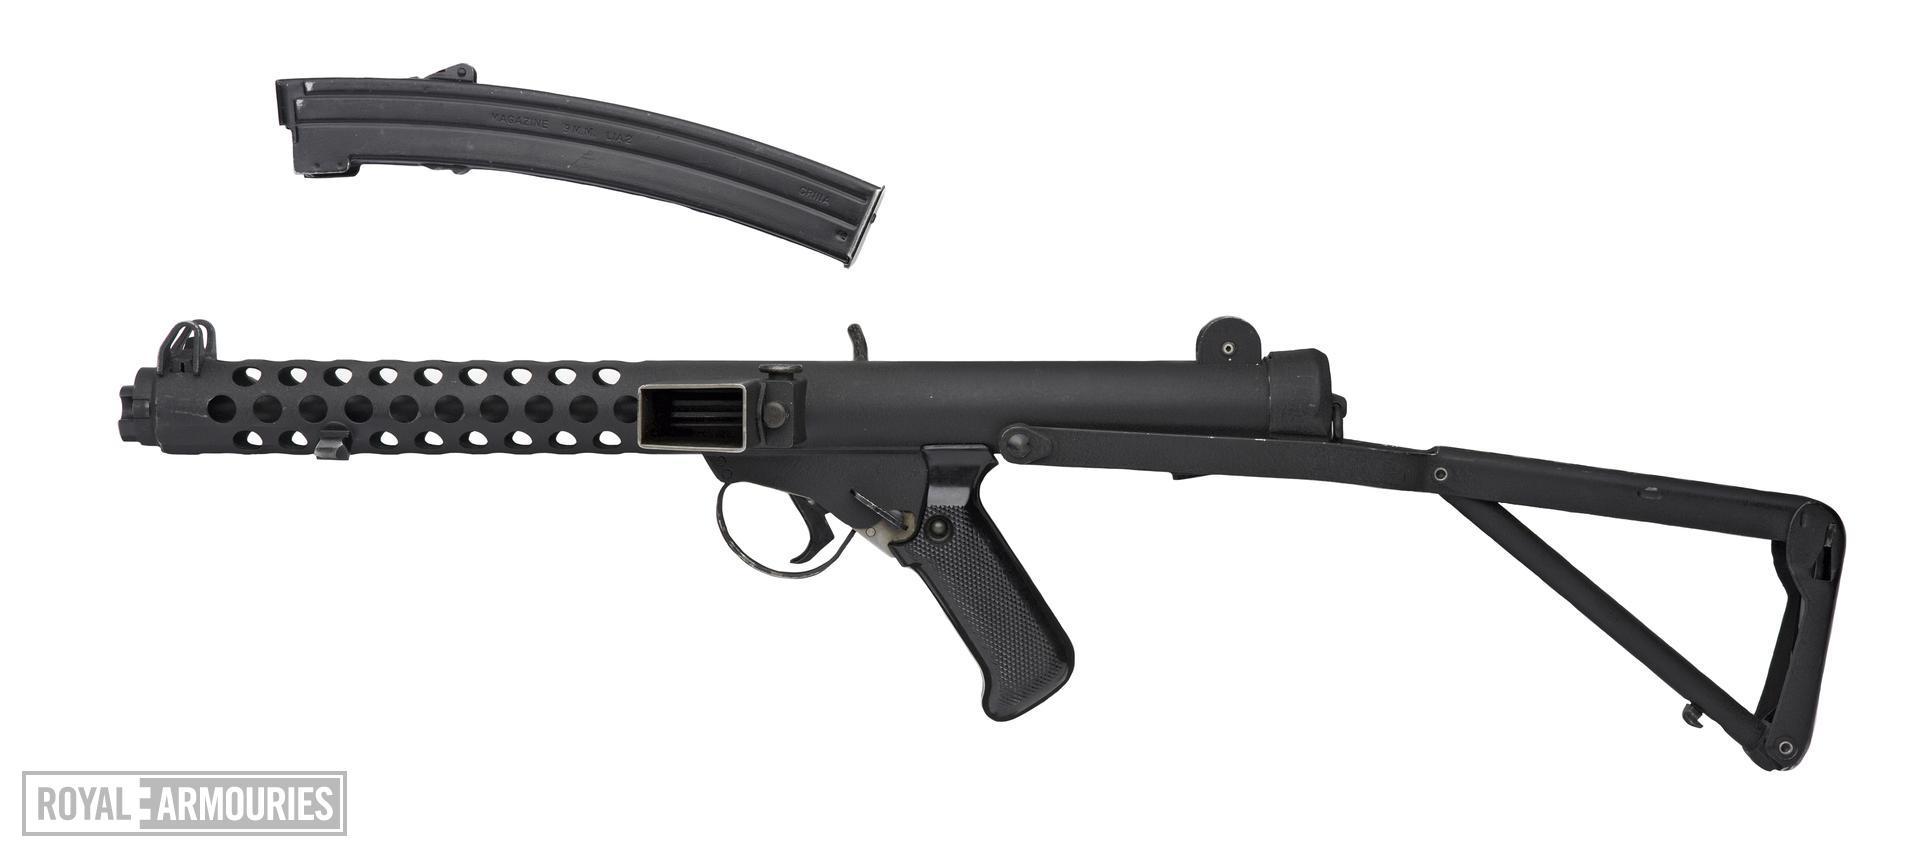 Centrefire automatic submachine gun - Sterling Mk.IV (L2A3) First production gun